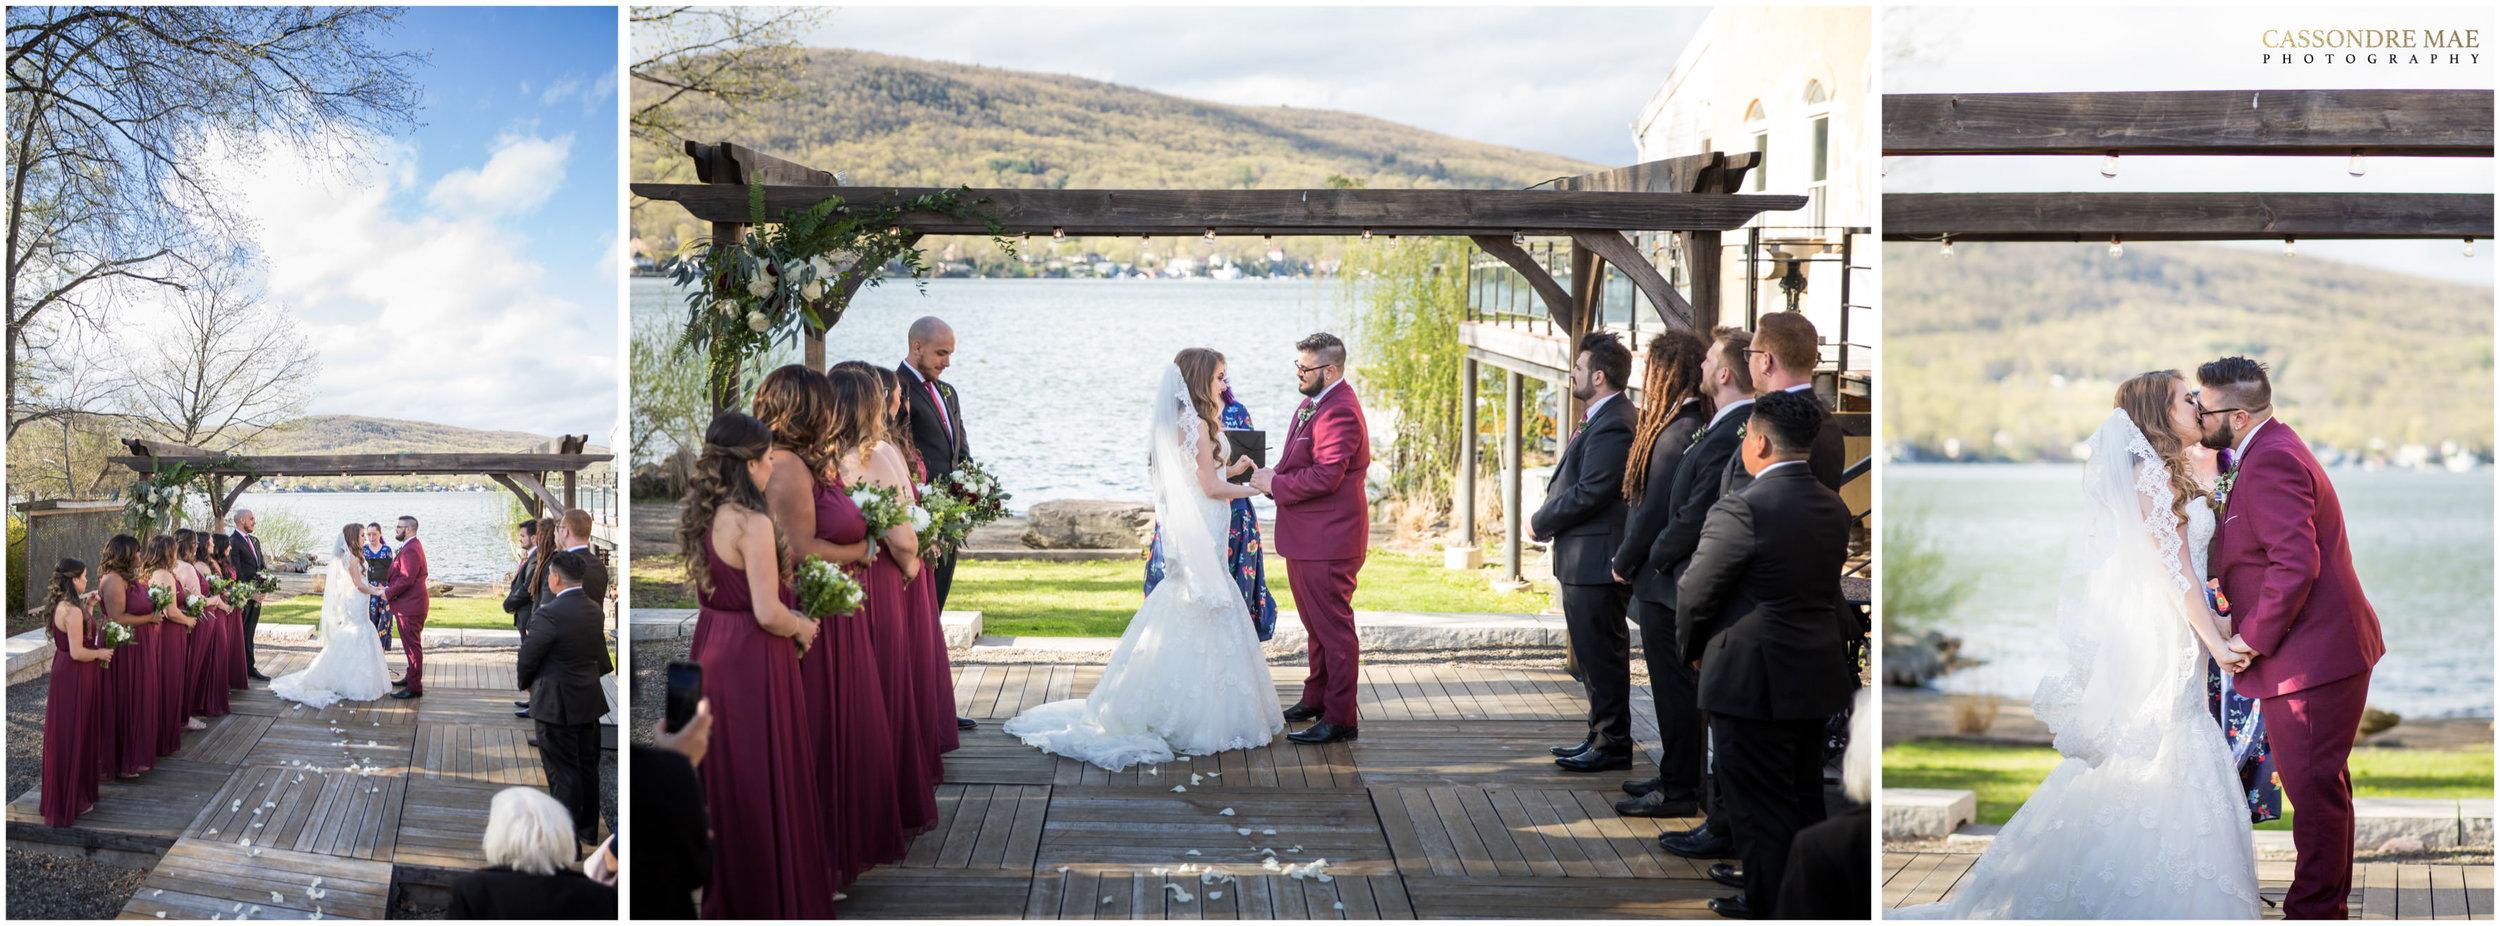 Cassondre Mae Photography Cove Castle Weddings 21.jpg